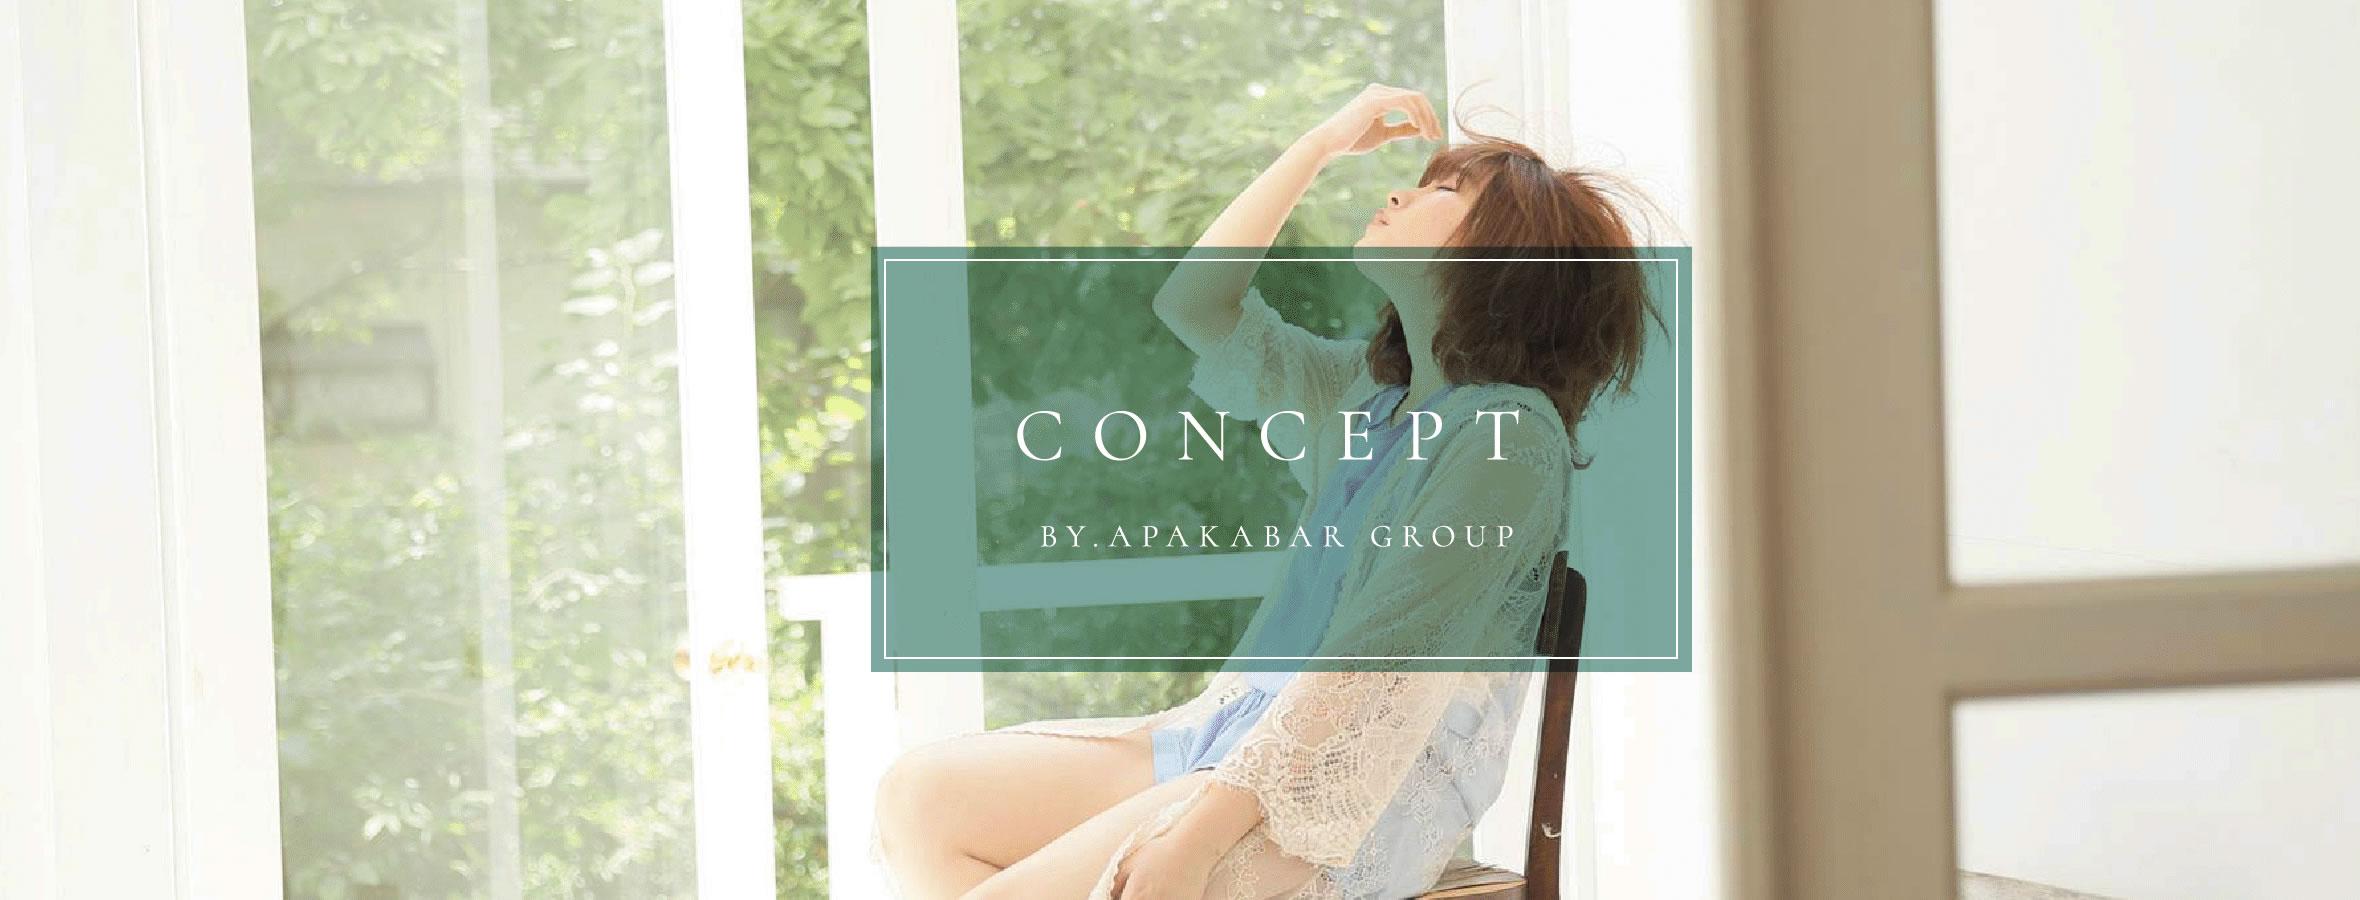 APAKABAR concept